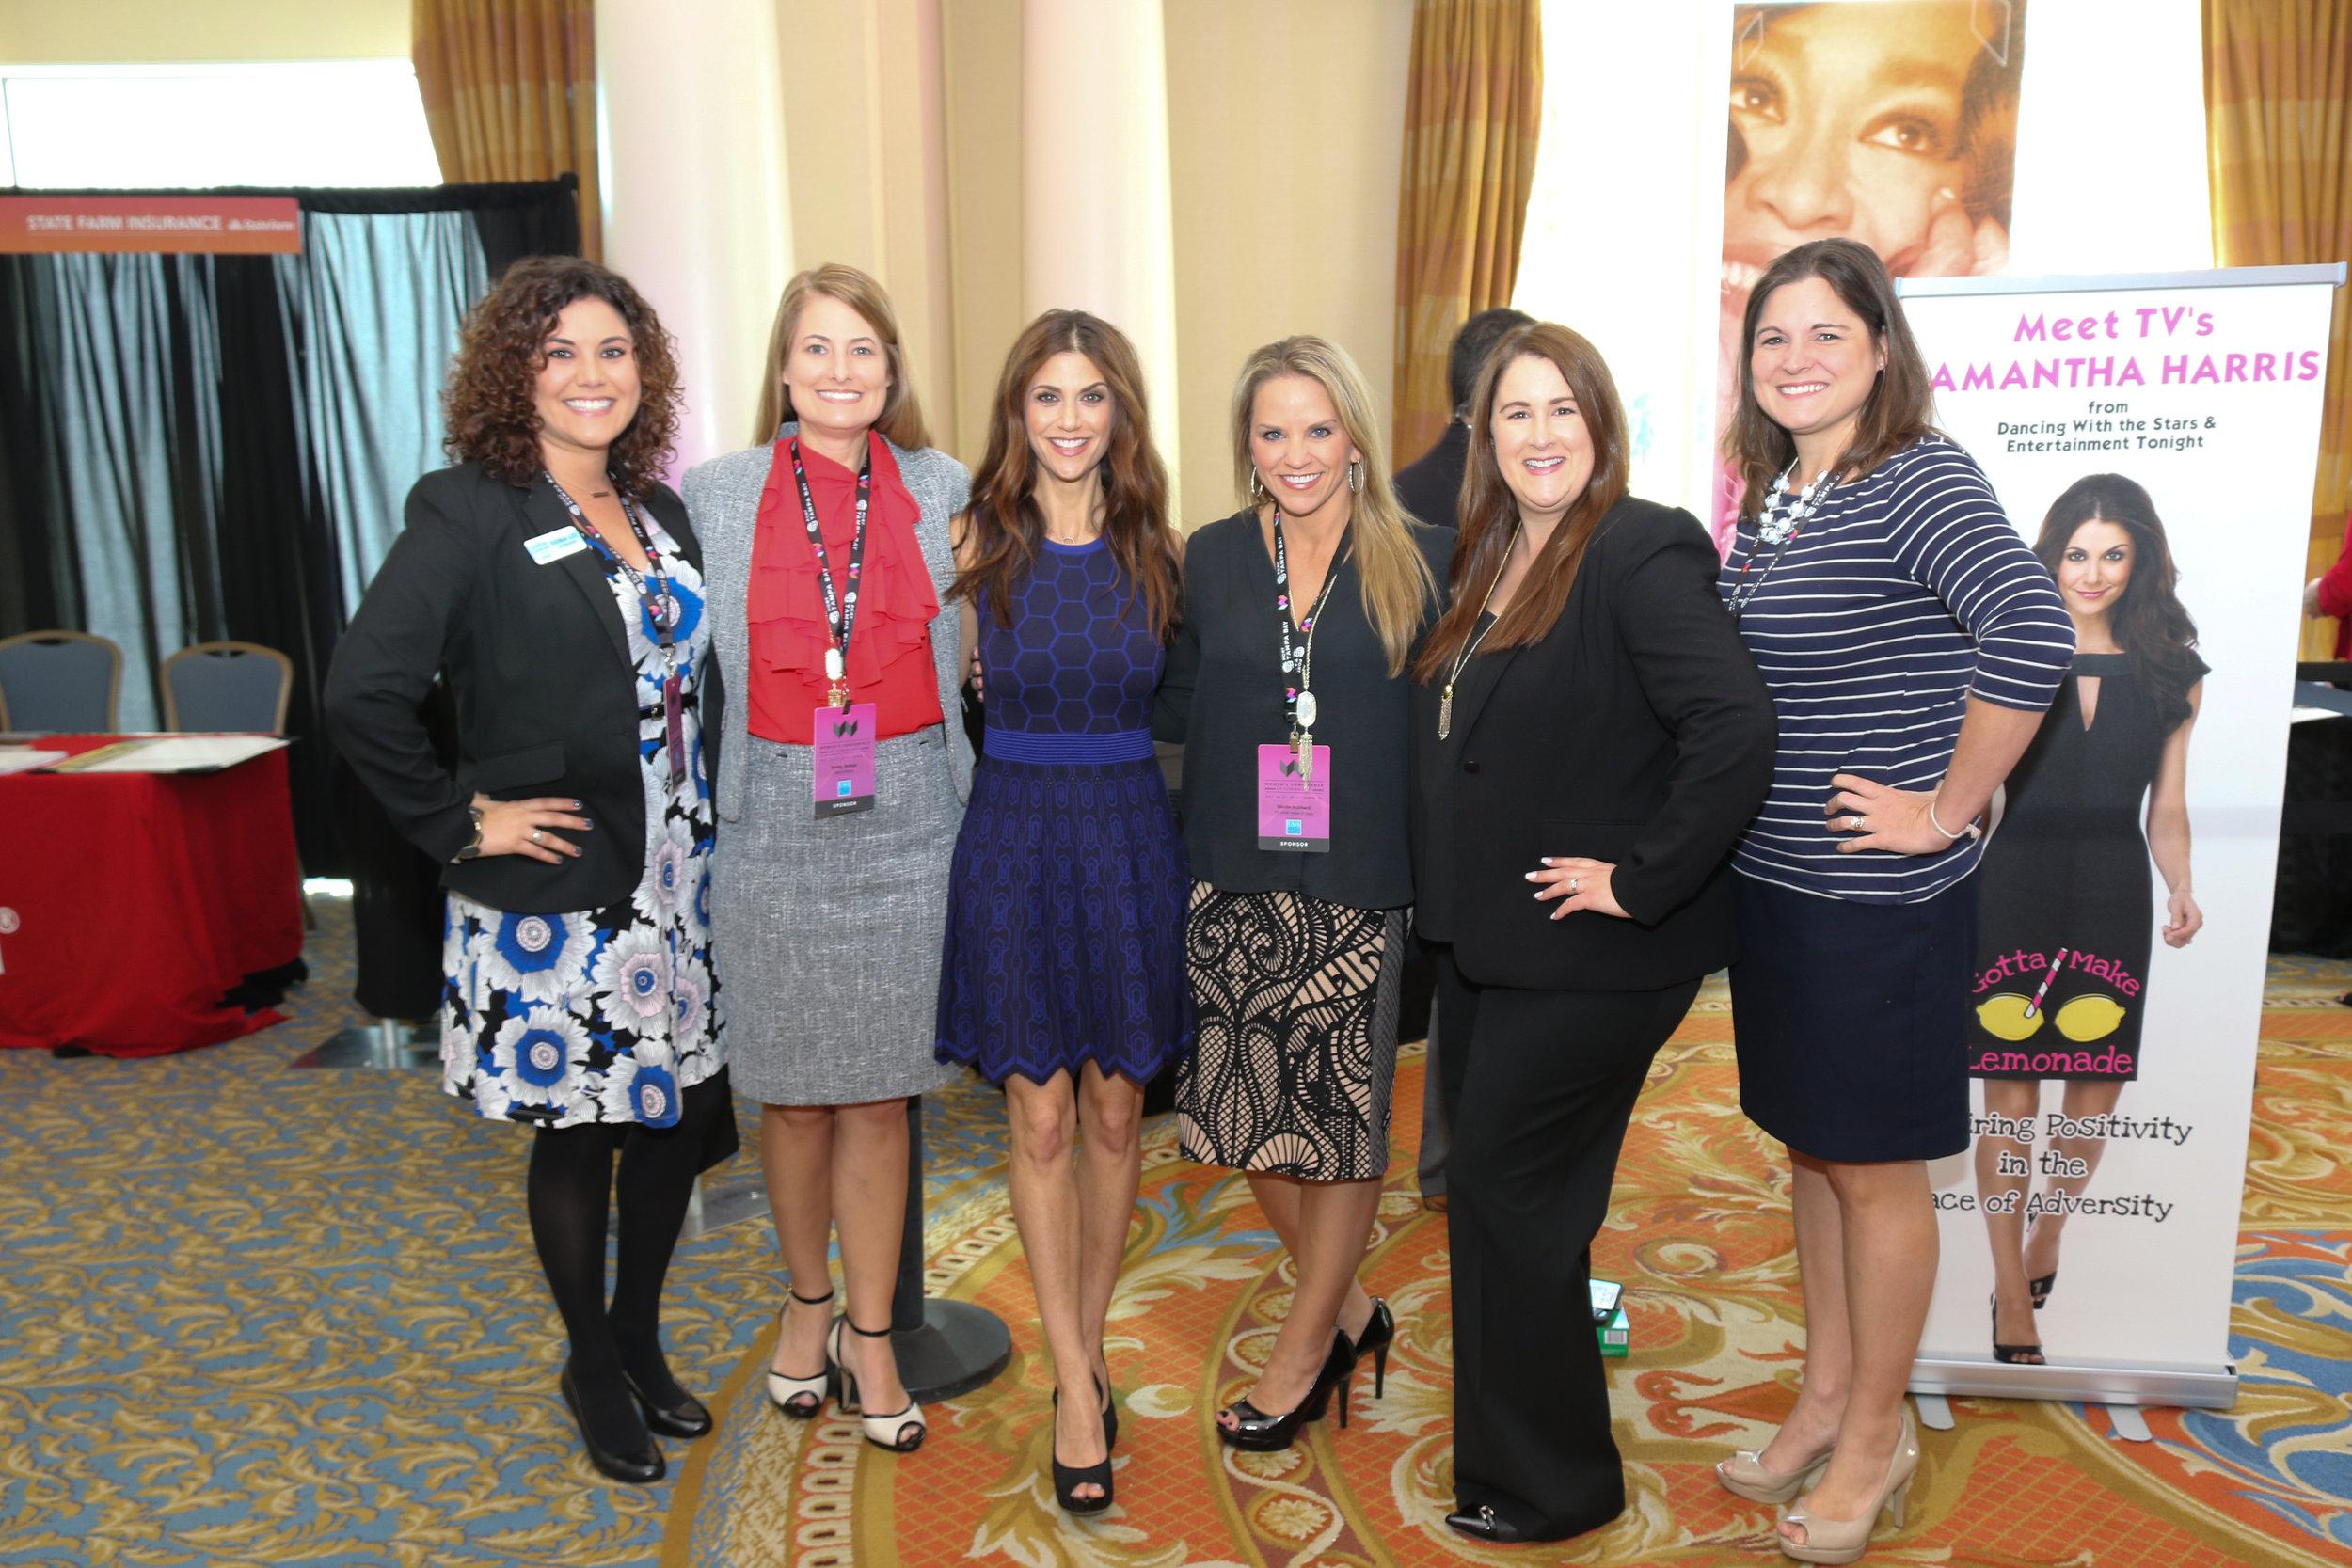 525_WomensConference_10-27-17.jpg